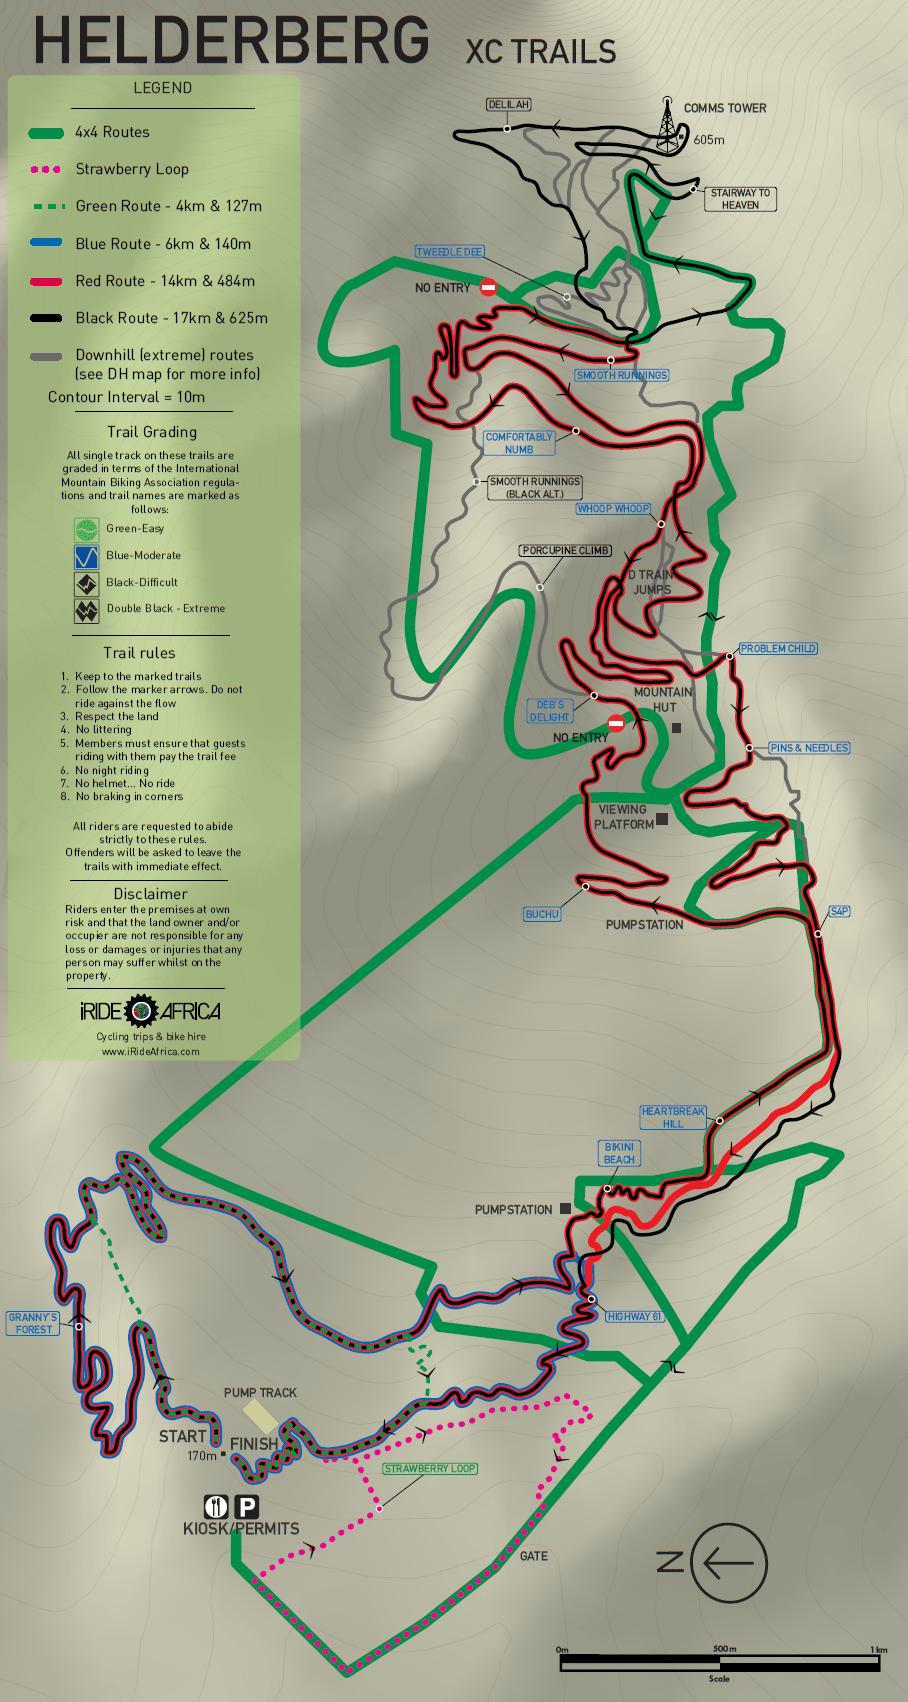 Helderberg MTB trail map XC iRide AfricaiRide Africa